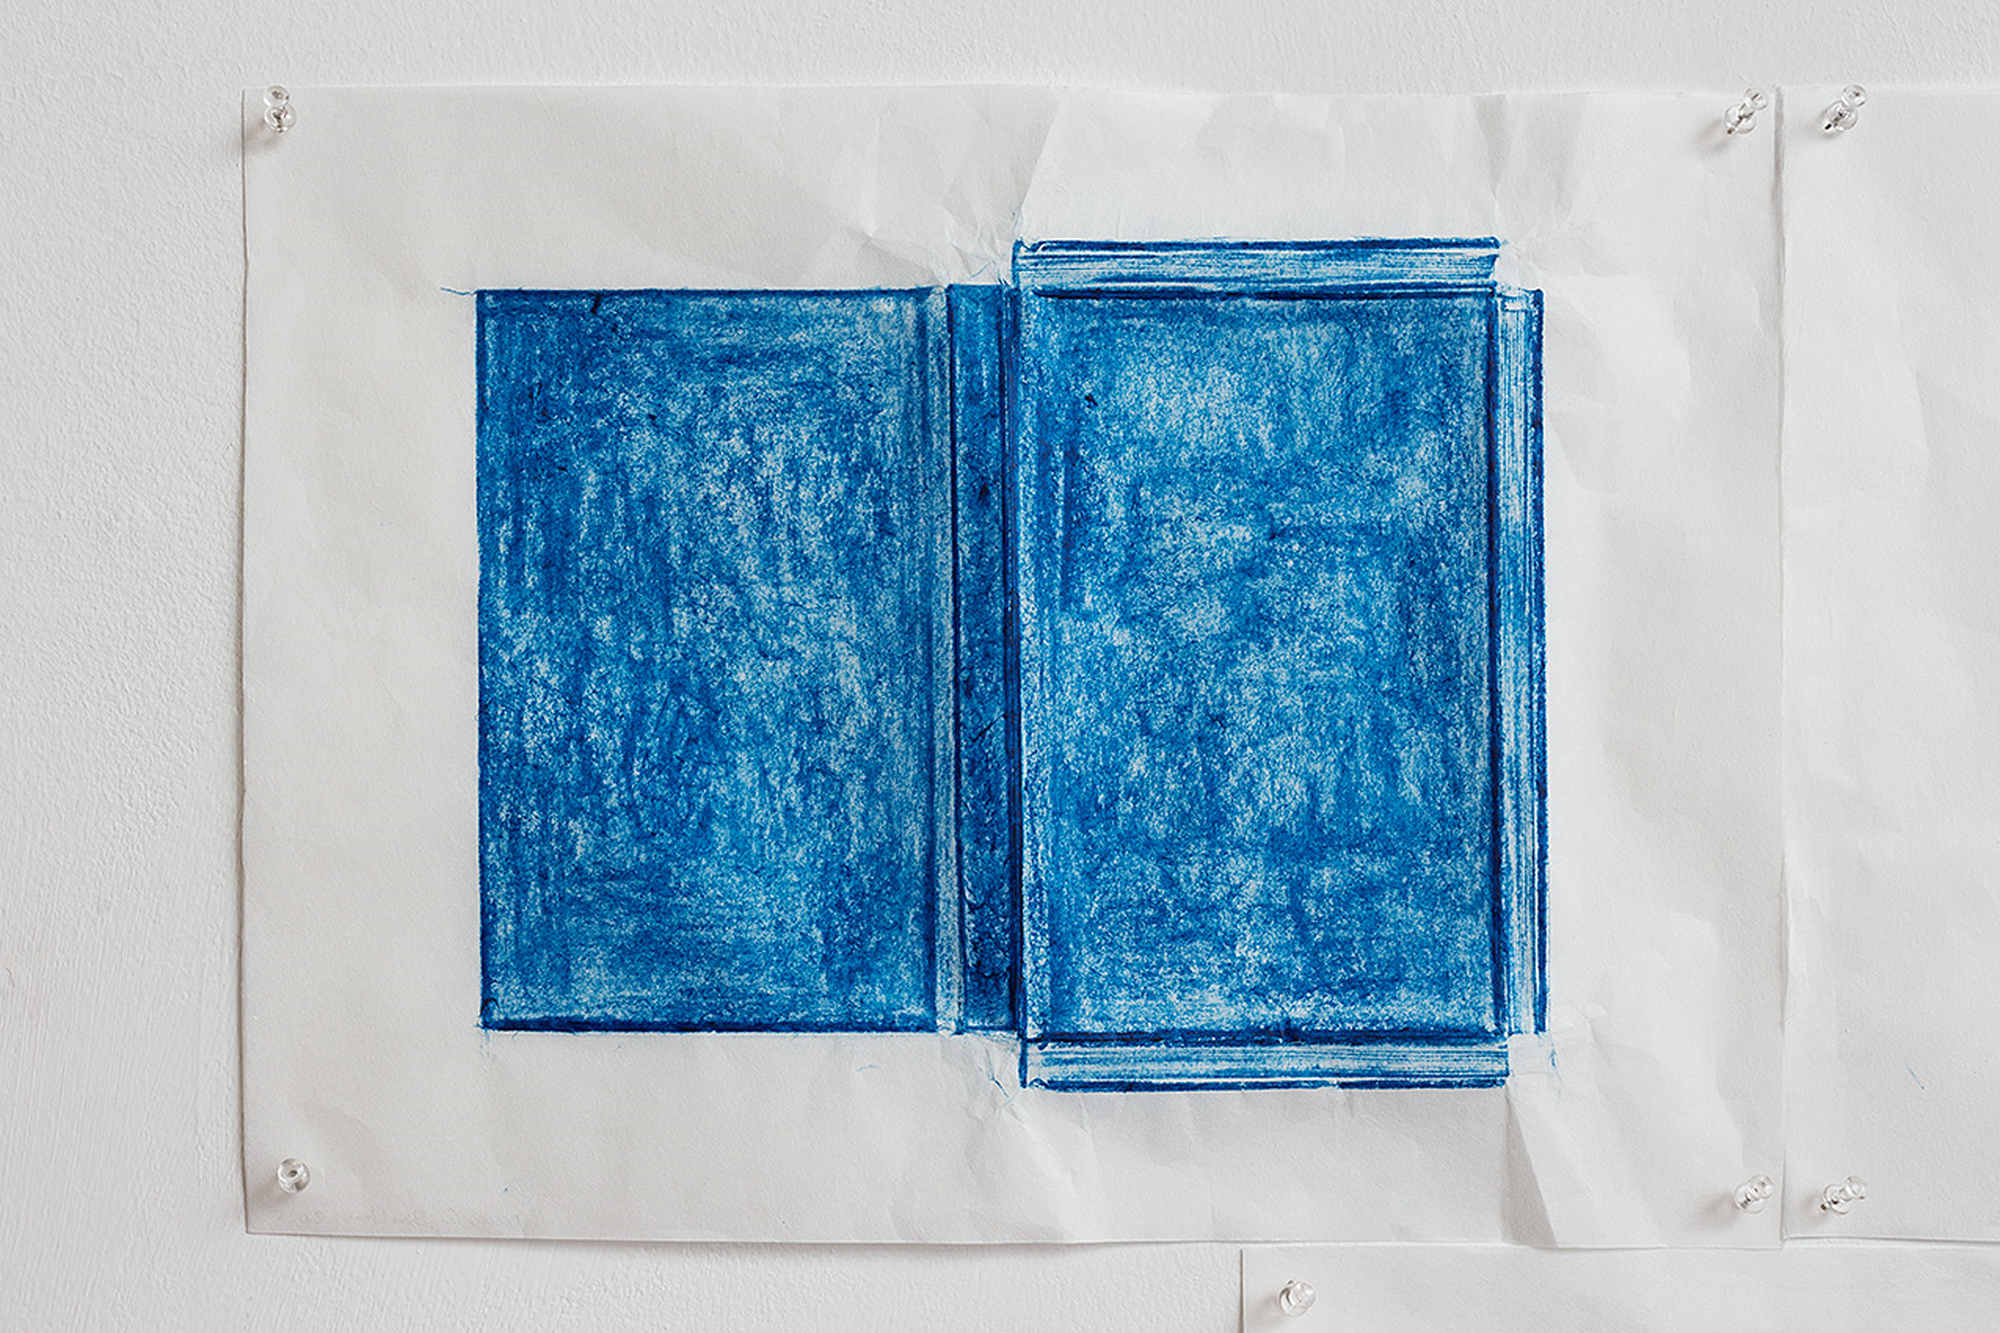 Jennifer Bornstein, Printed Matter, rubbing (encaustic and wax on Kozo paper), 31.5x42.5 cm, unique